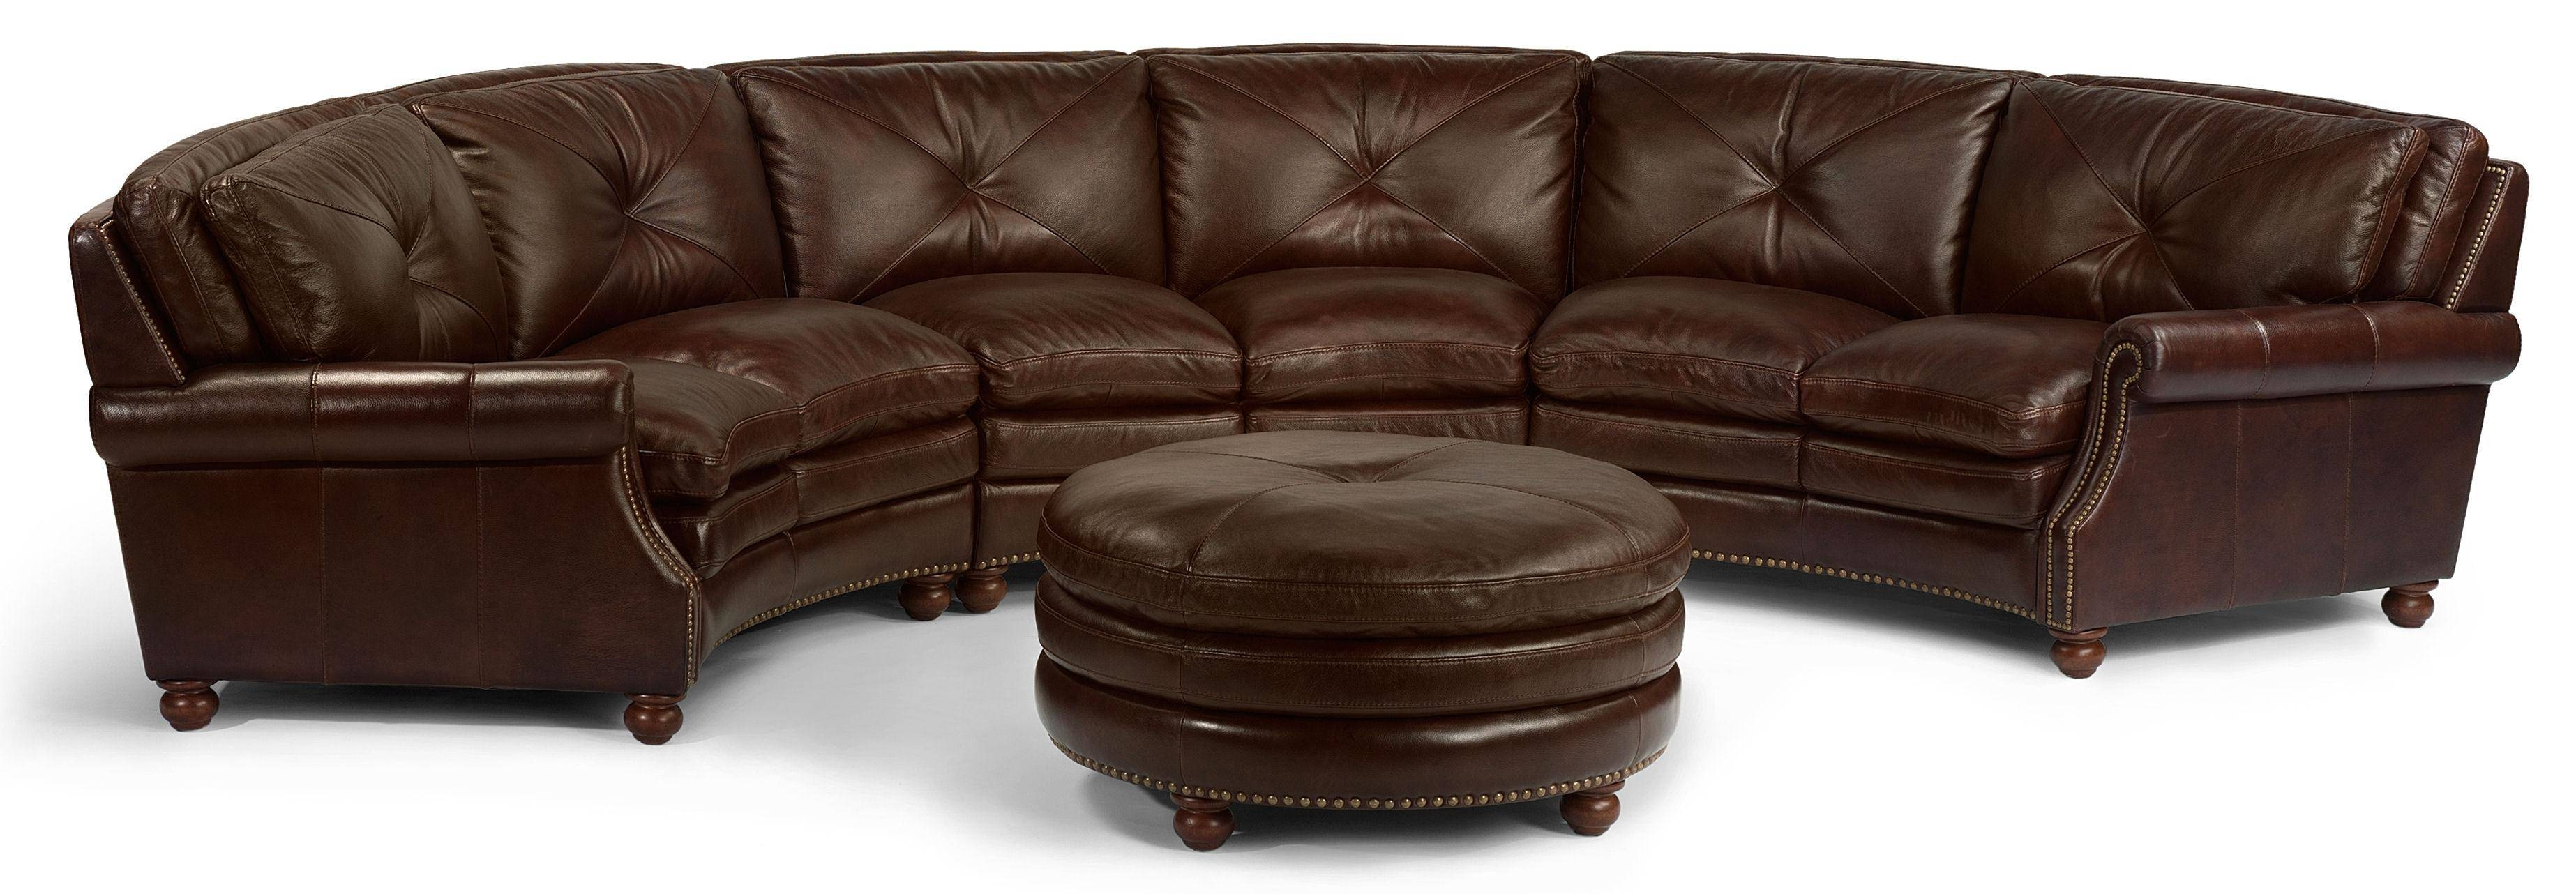 Flexsteel Latitudes-Suffolk Round Sectional Sofa With Nailhead inside Round Sectional Sofa (Image 6 of 30)